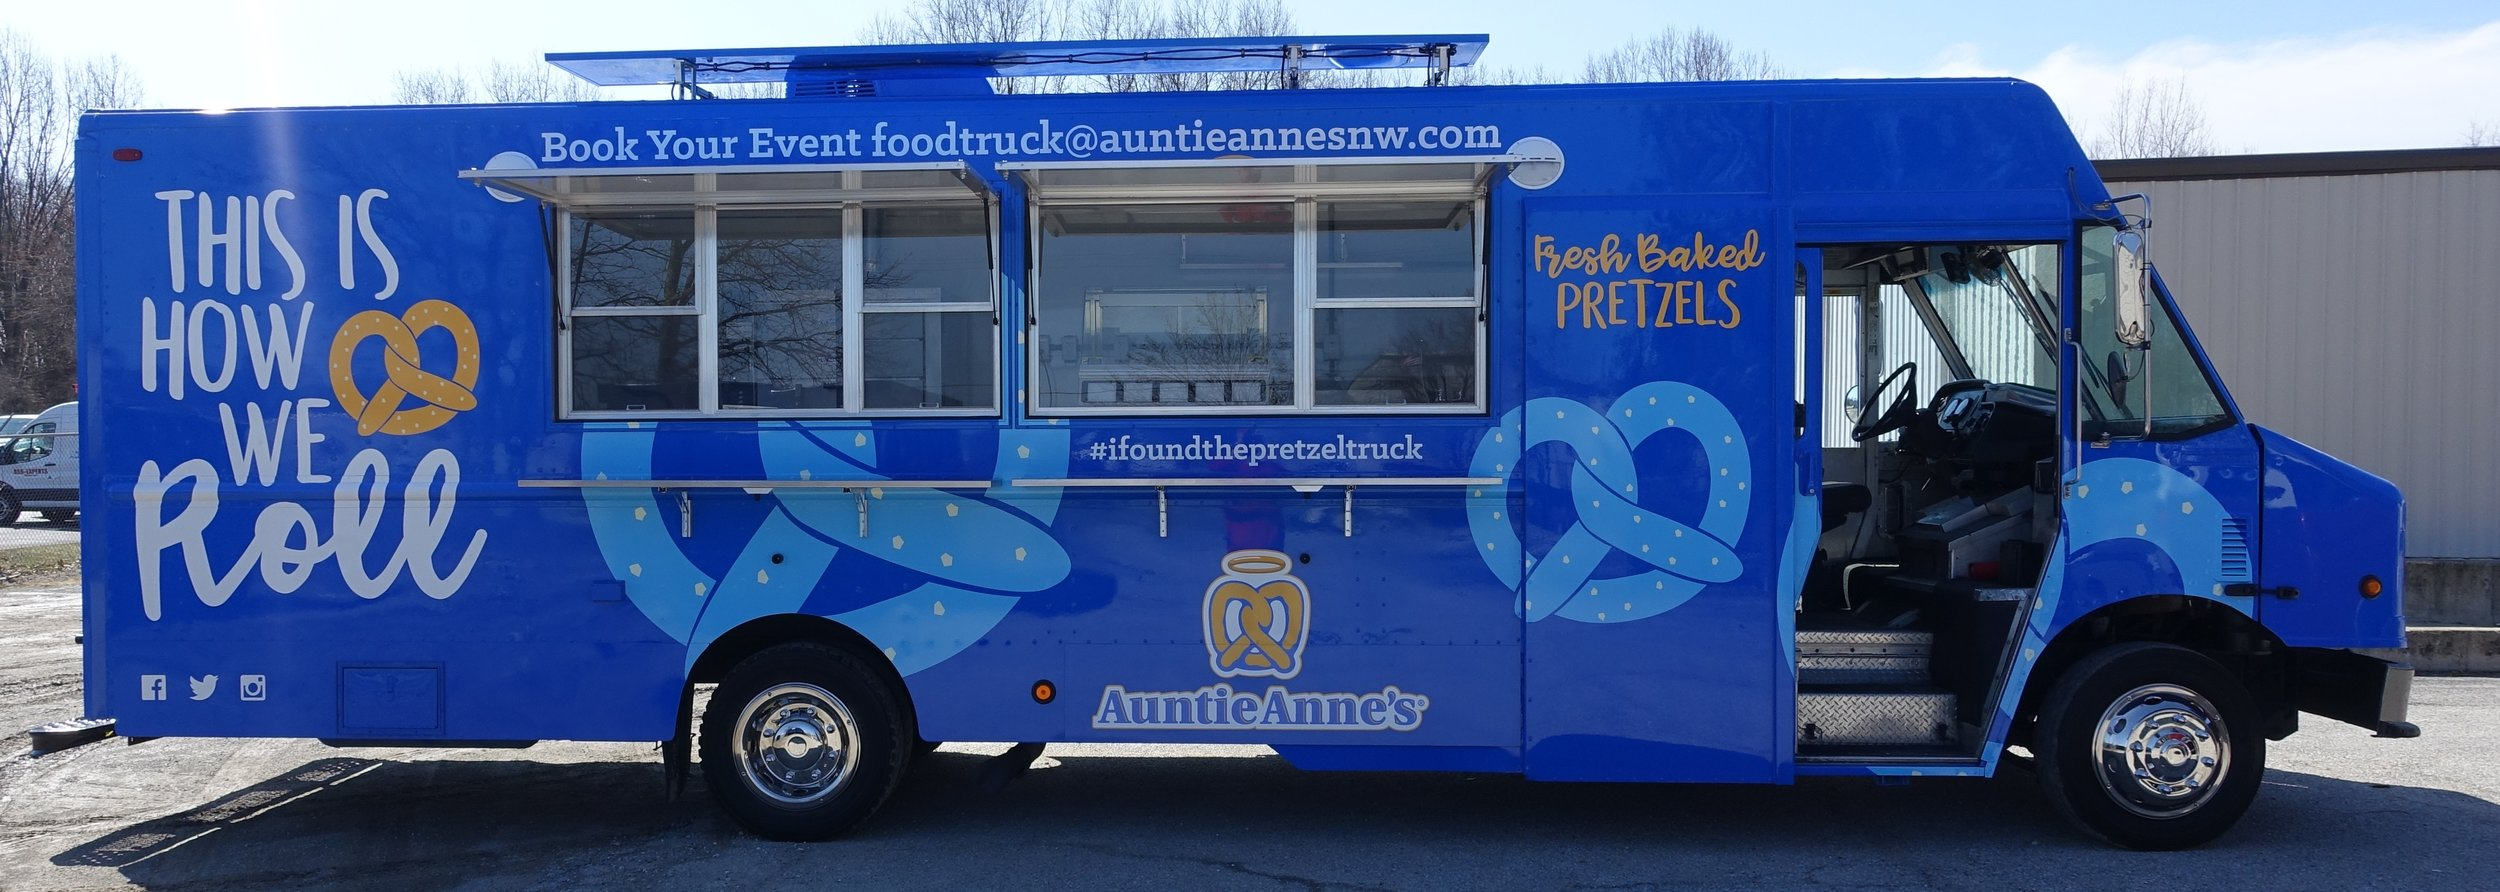 Auntie Anne's Pretzels - Pretzels, Dips, Pretzel DogsFind on FacebookTwitter: @anne_spoWebsite: http://www.auntieannes.comPhone: 425-774-3338Email: slesh@wvs.orgAvailable for cateringAlso serves in: Everett, Mount Vernon & Marysville